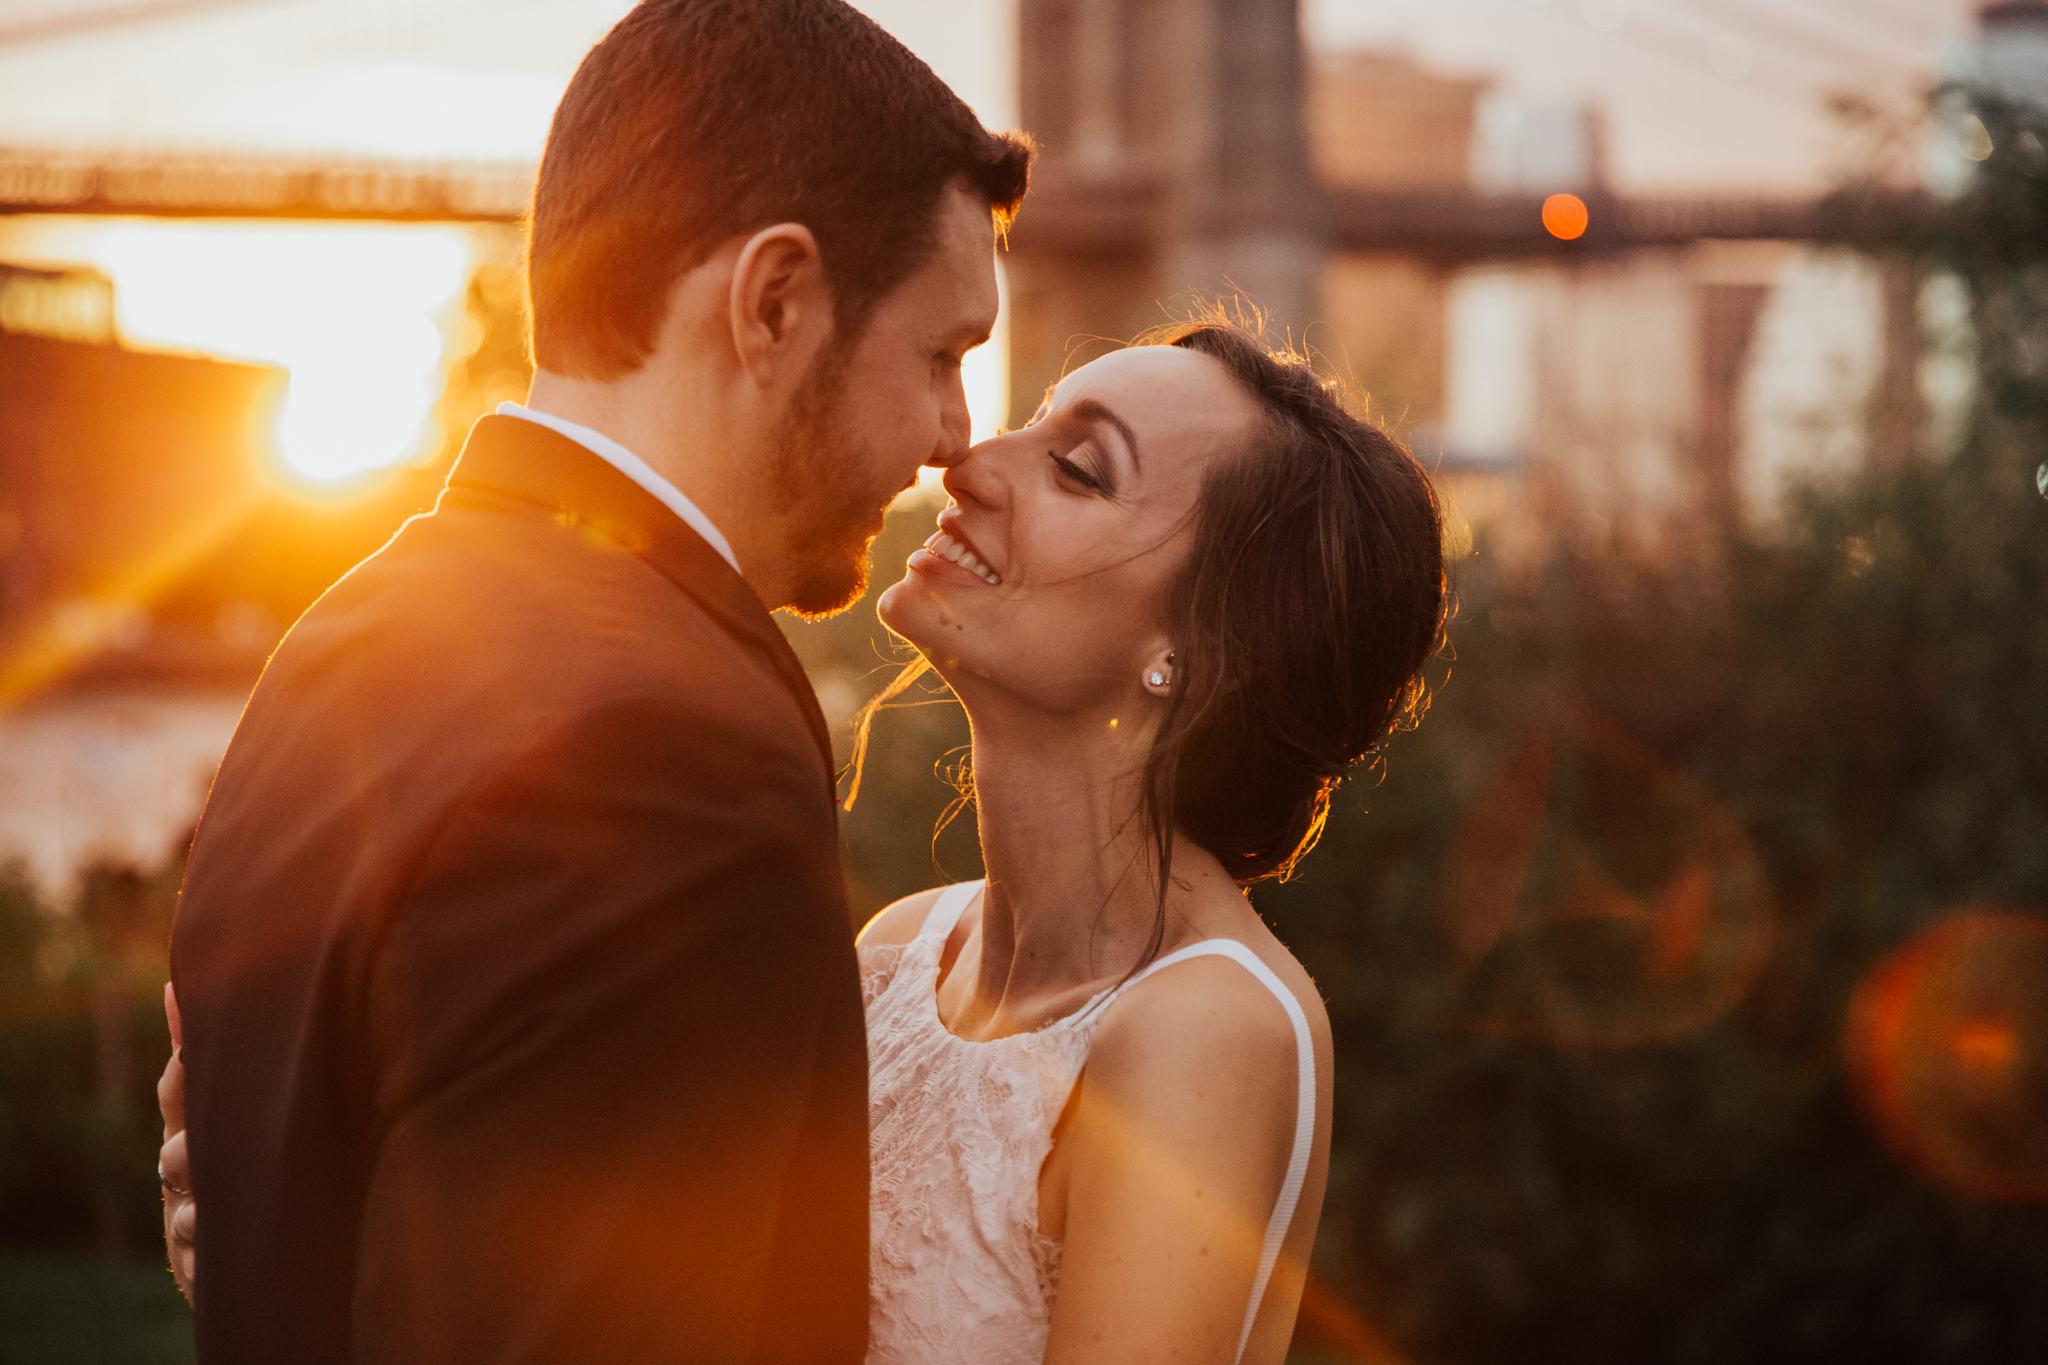 26-bridge-wedding-brooklyn-069.JPG